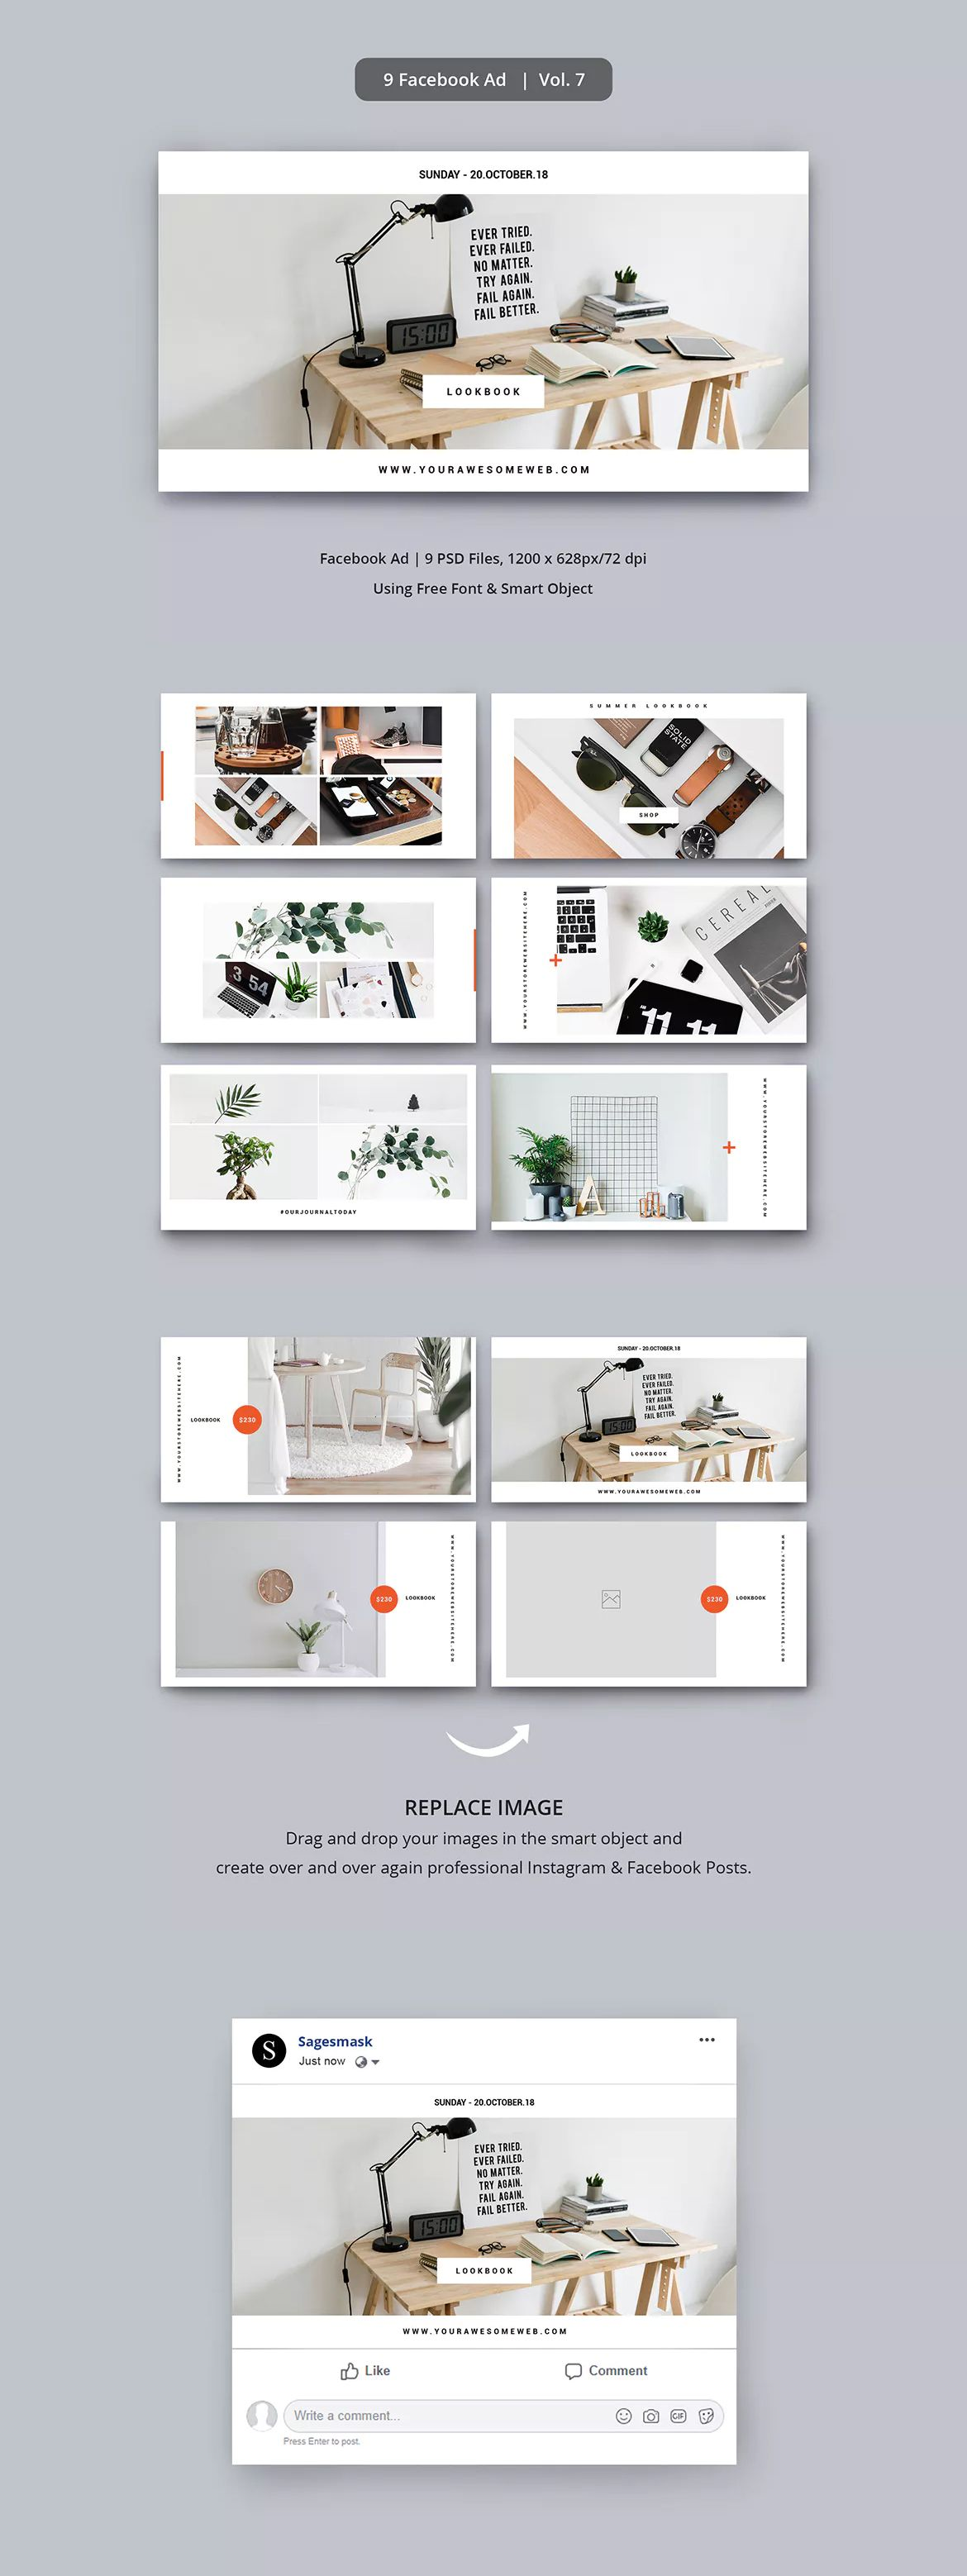 Facebook Ad Vol 7 By Sagesmask On Facebook Ad Template Facebook Ads Design Facebook Ads Inspiration